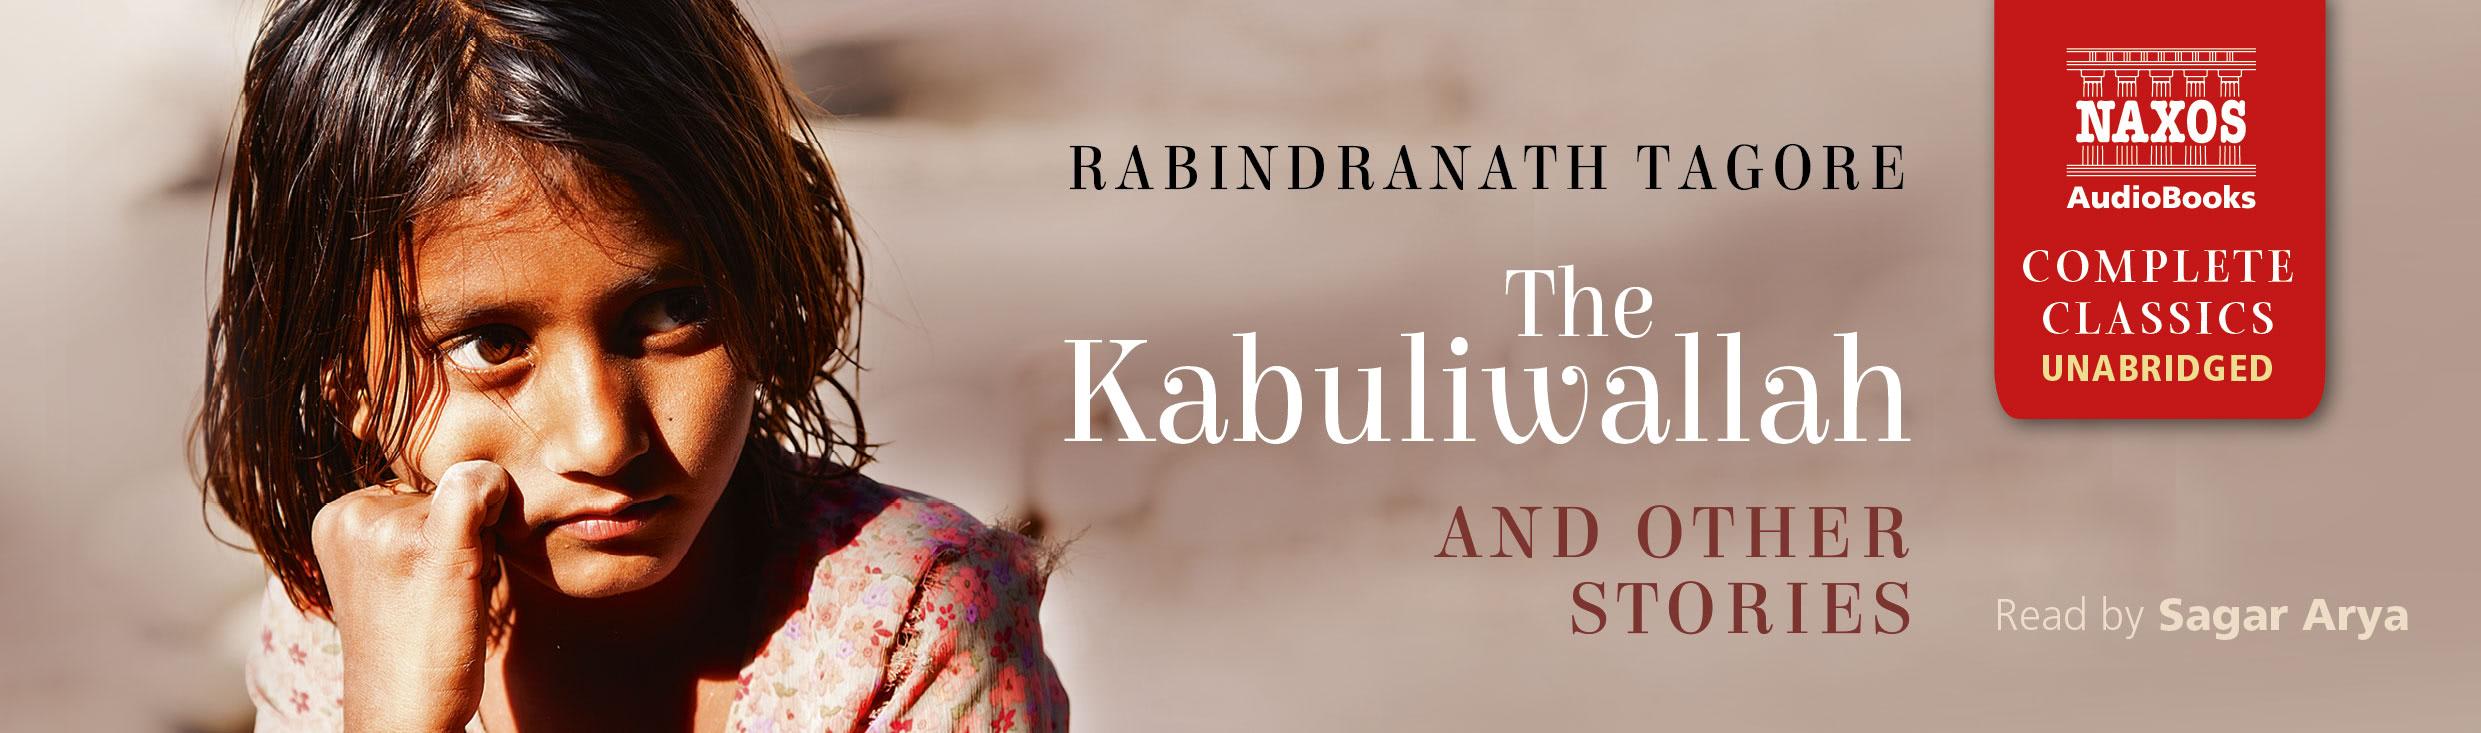 The Kabulliwallah (unabridged)